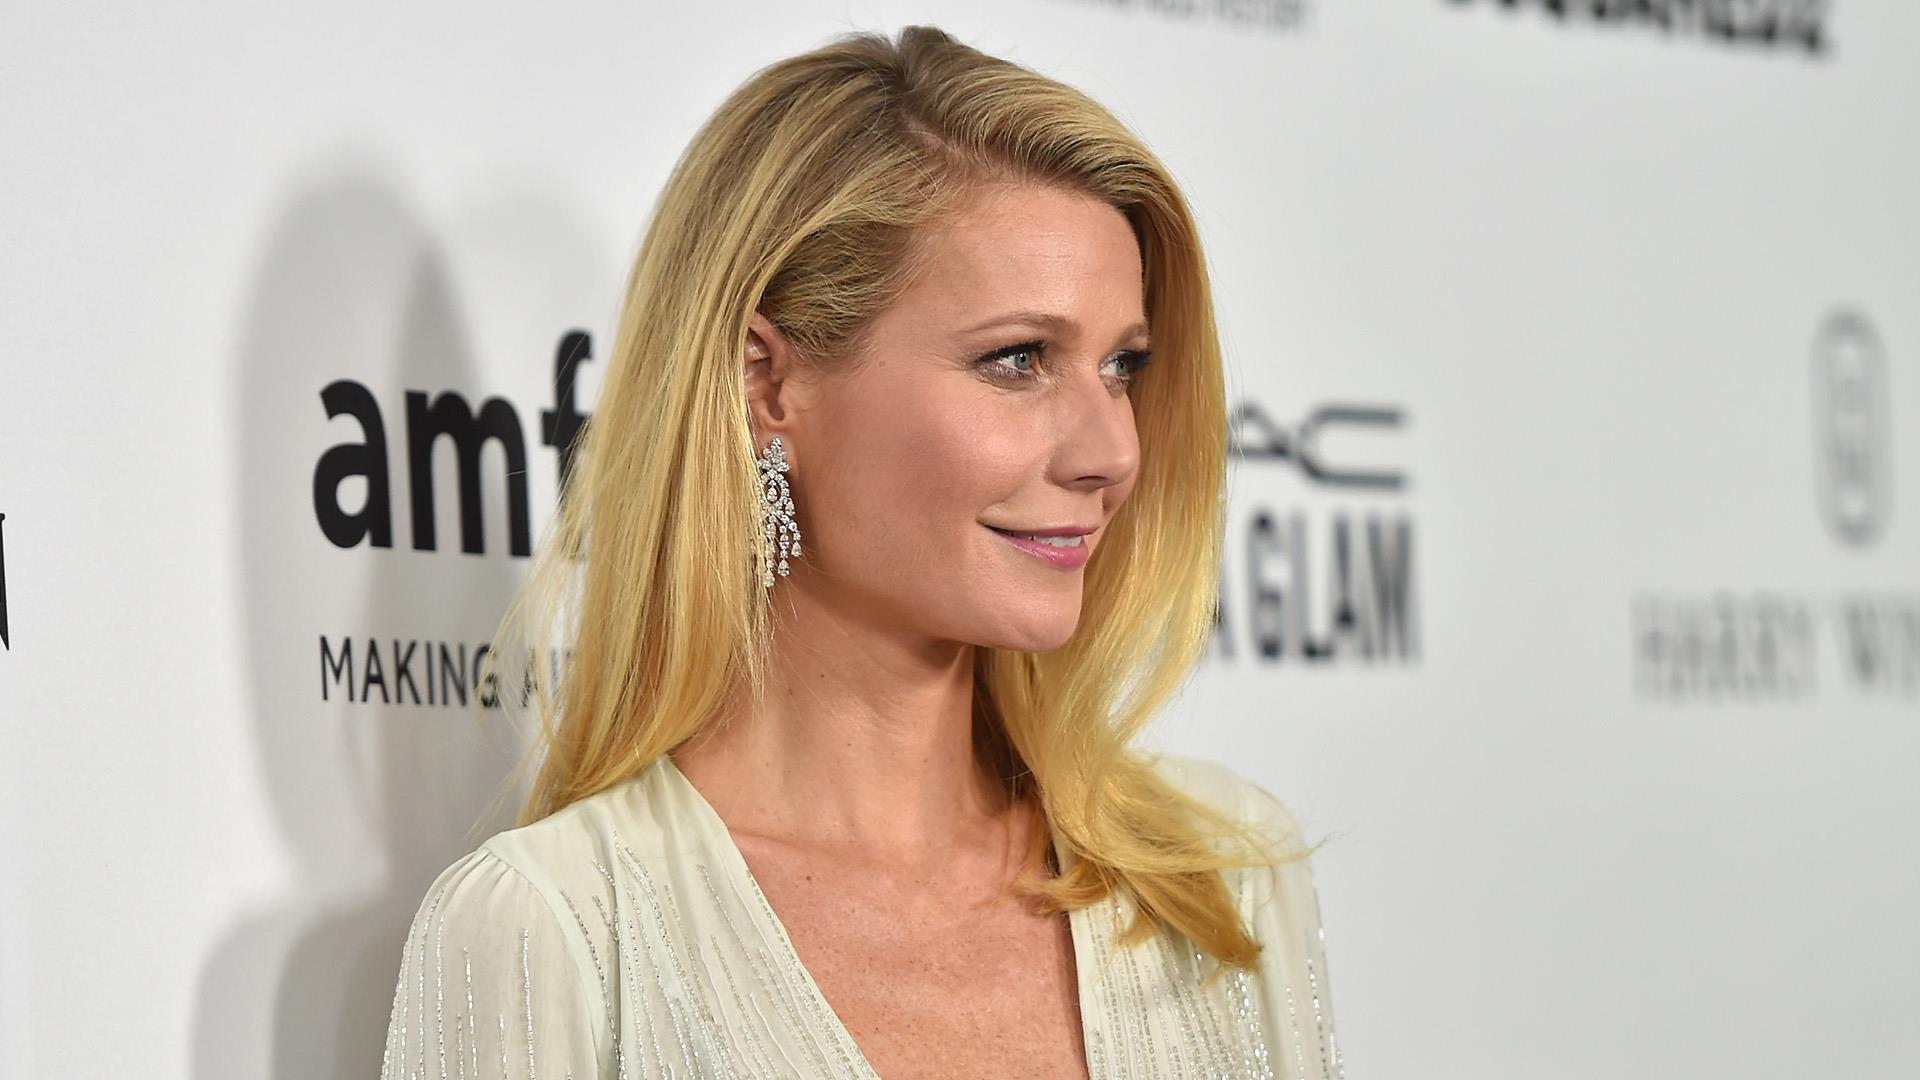 Foto: Actrița Gwyneth Paltrow a dat lovitura în business lansând vibratorul inteligent